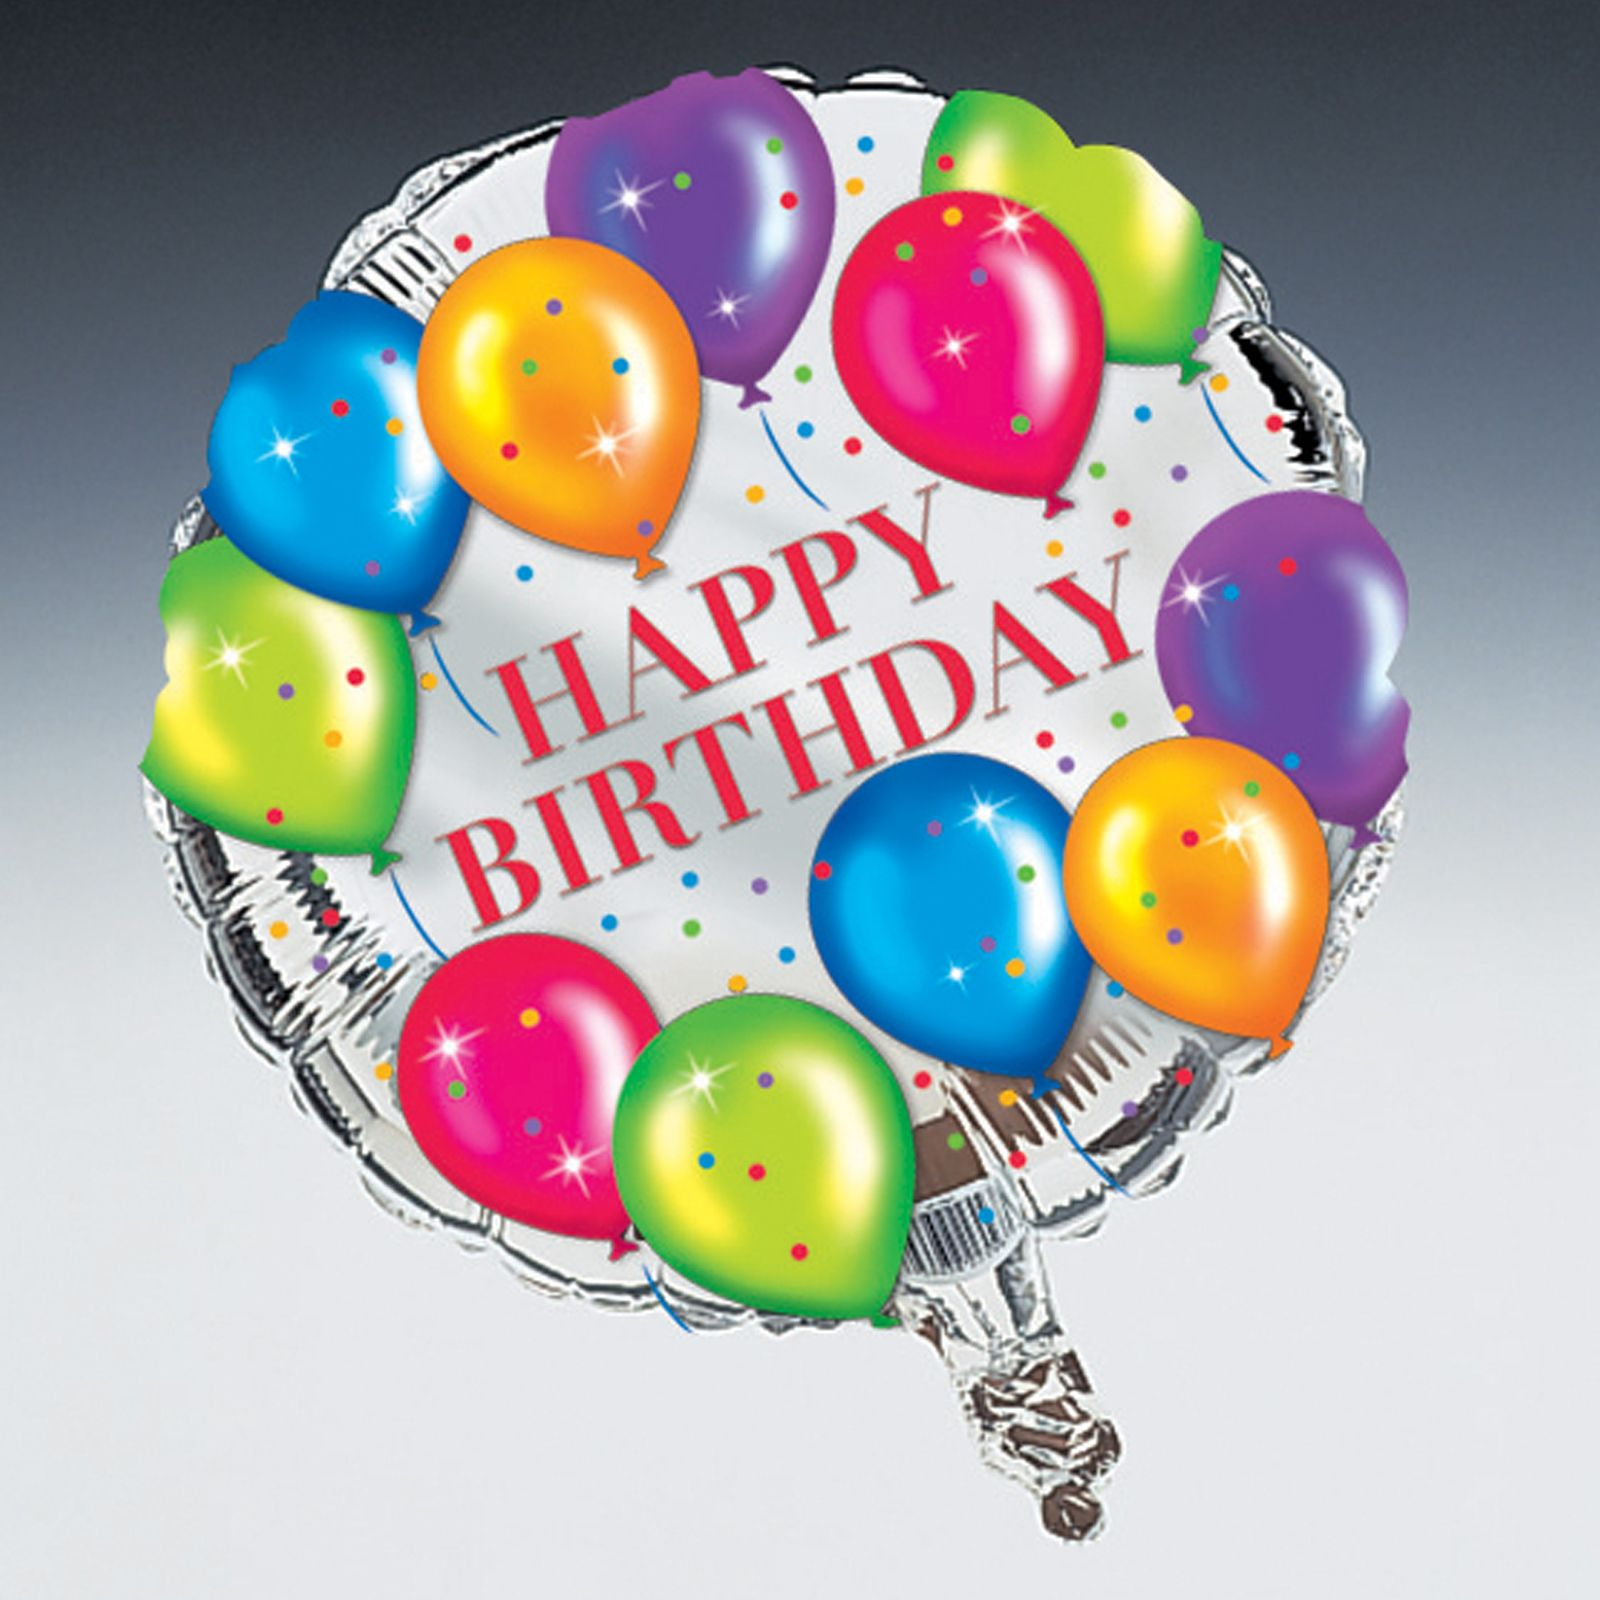 Happy Birthday To Isabelita Sapuras. Wishing You A